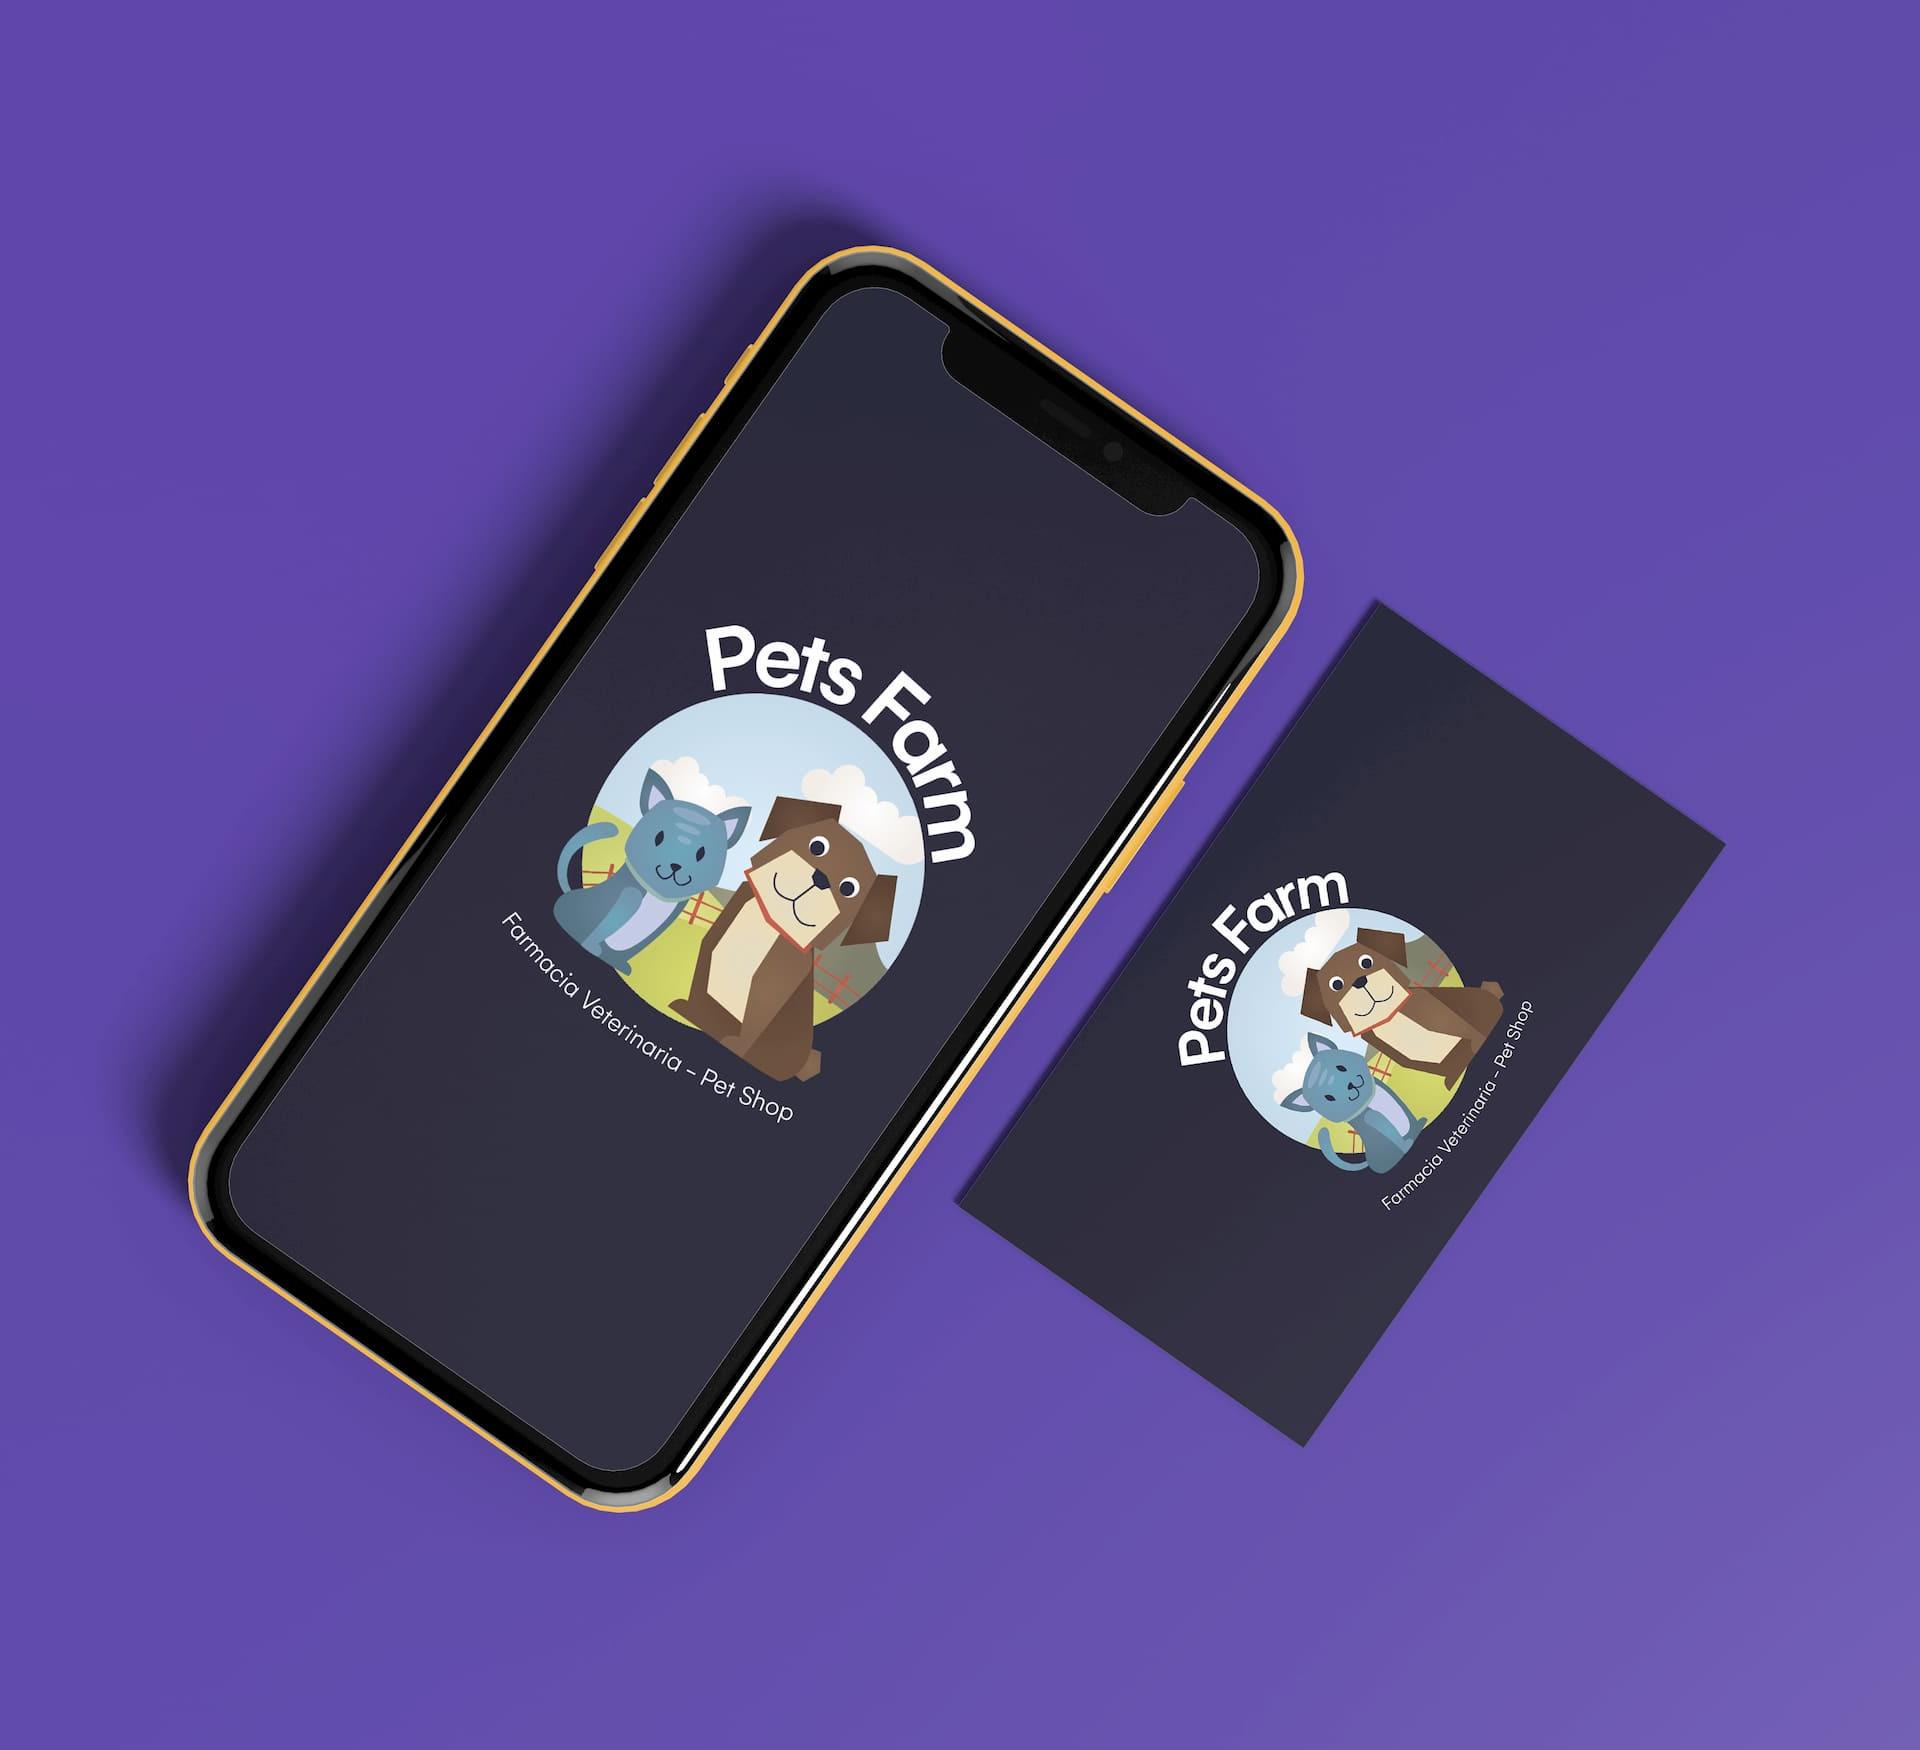 logo-perspective-petsfarm.jpg